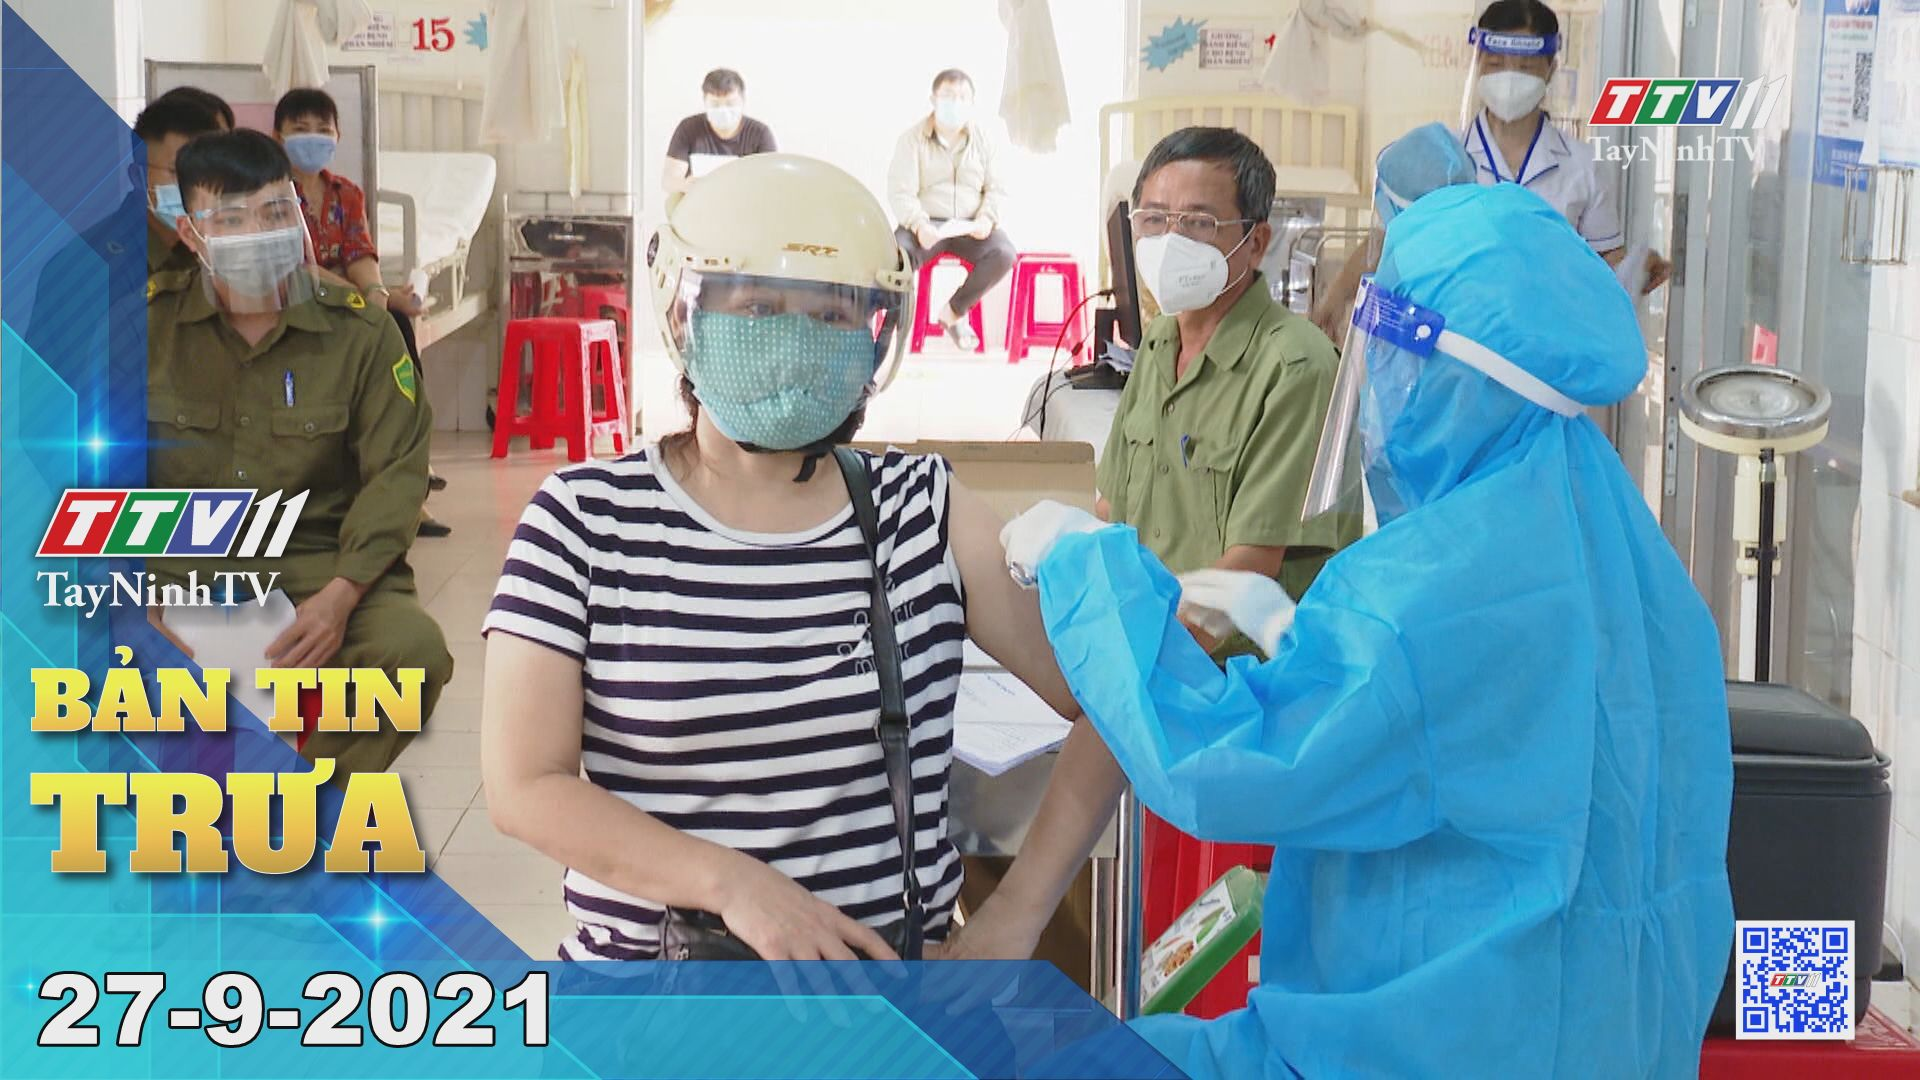 Bản tin trưa 27/9/2021 | Tin tức hôm nay | TayNinhTV